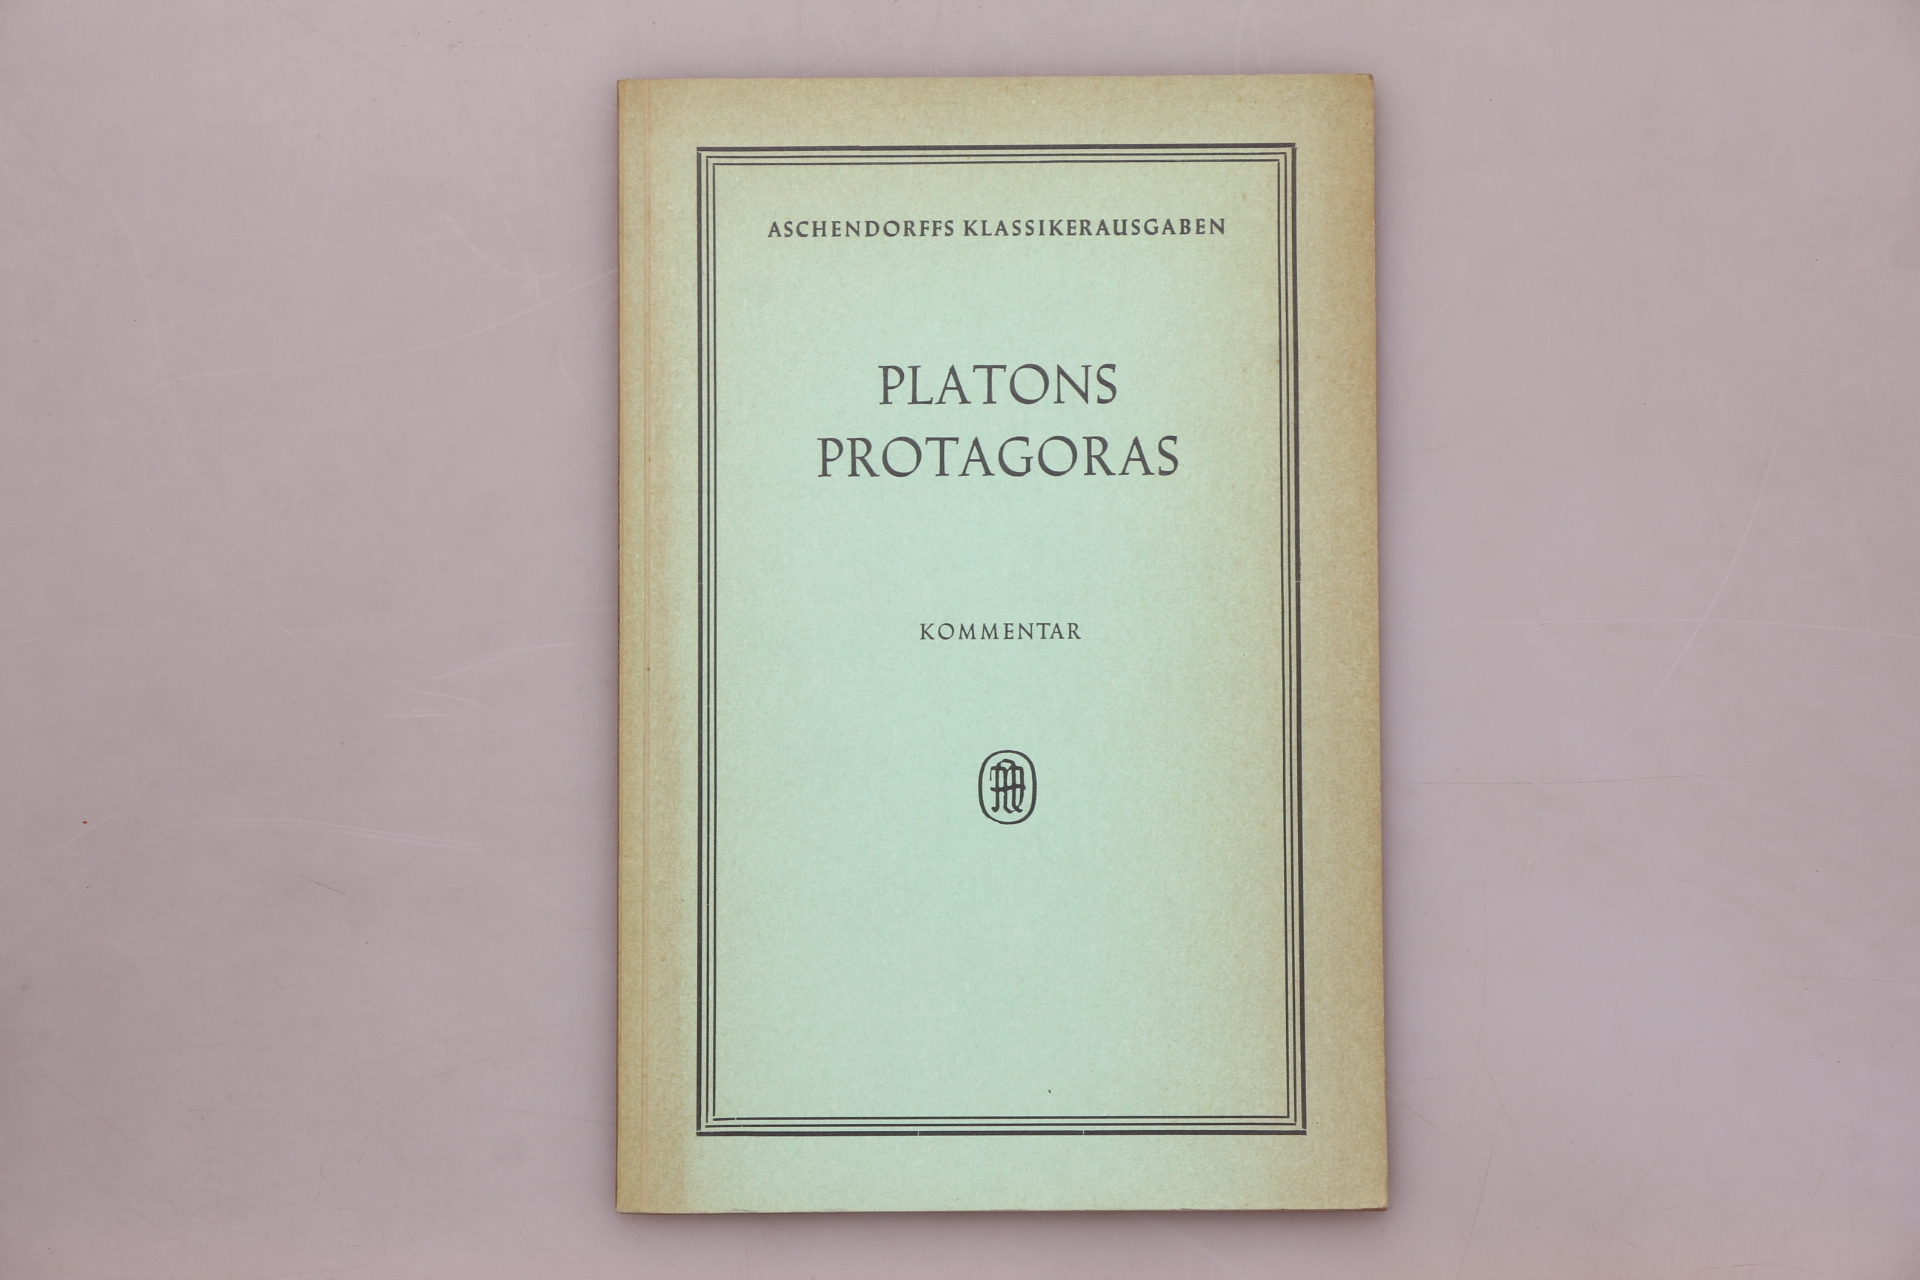 PLATONS PROTAGORAS